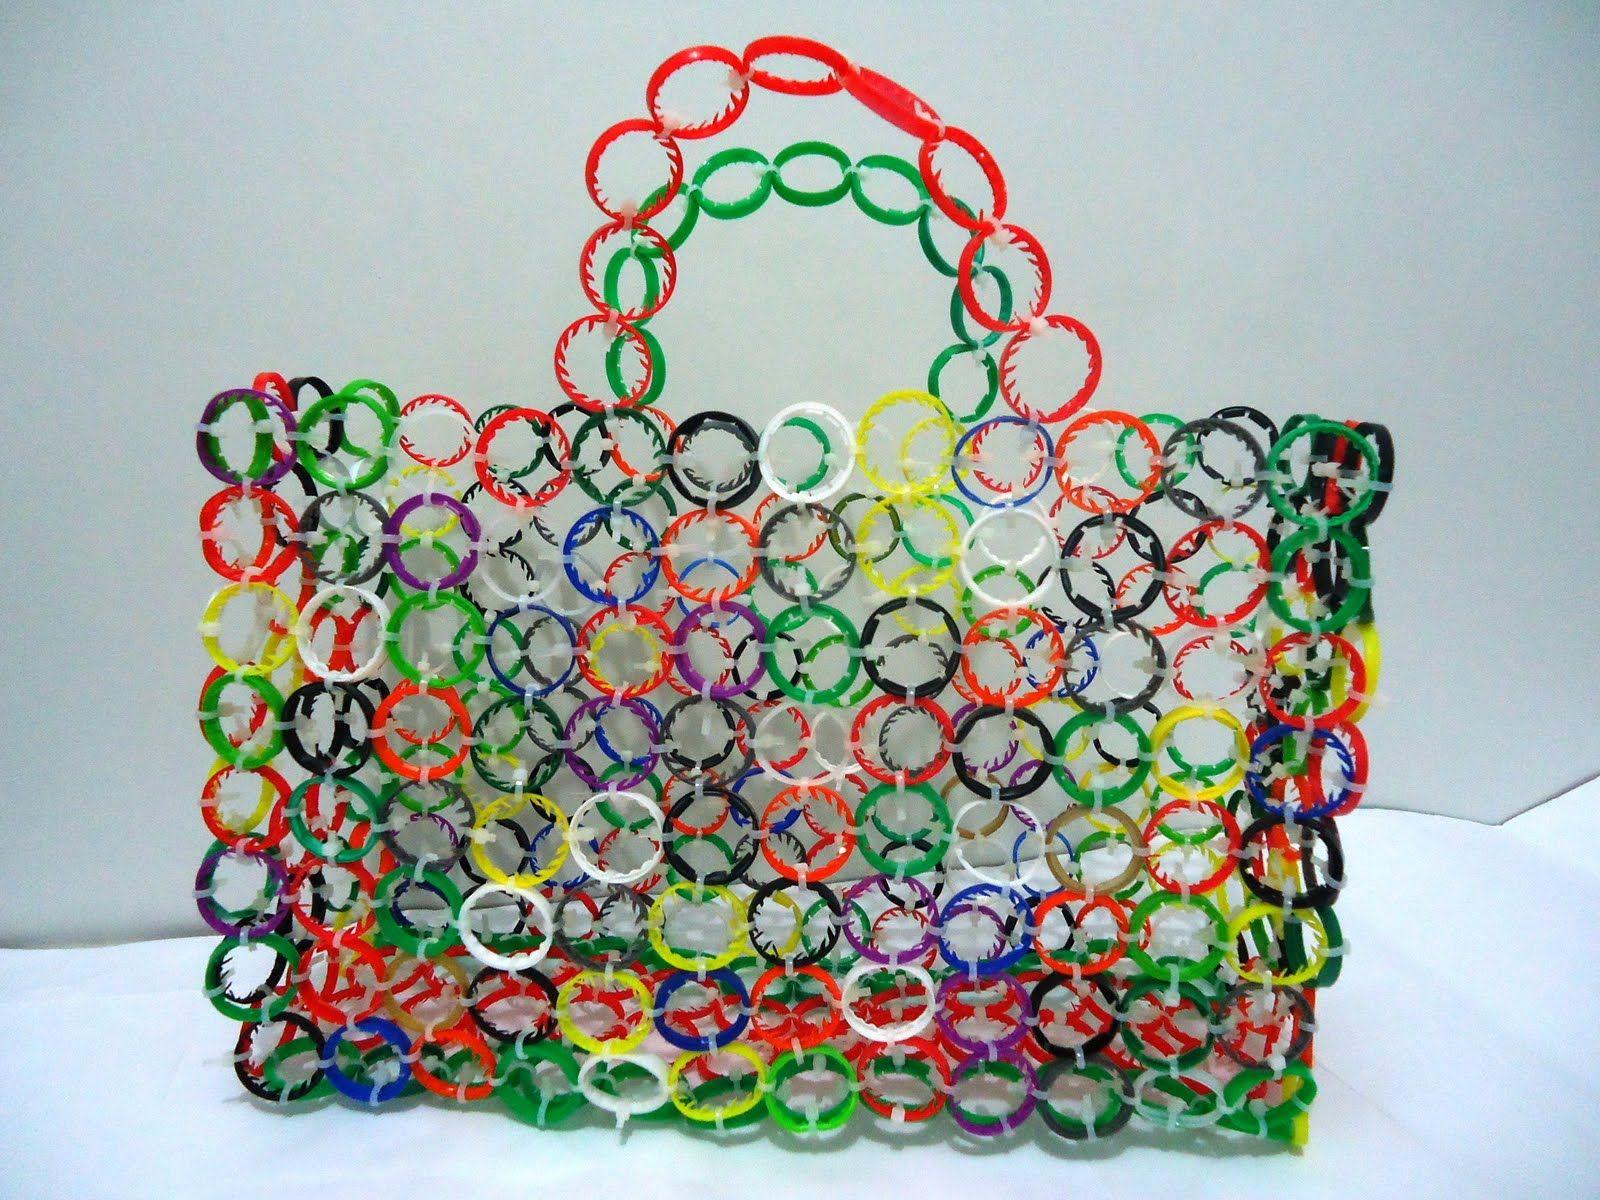 bf47f1ea7 Como fazer bolsa de garrafa PET 10   BOLSOS   Garrafa pet artesanato ...